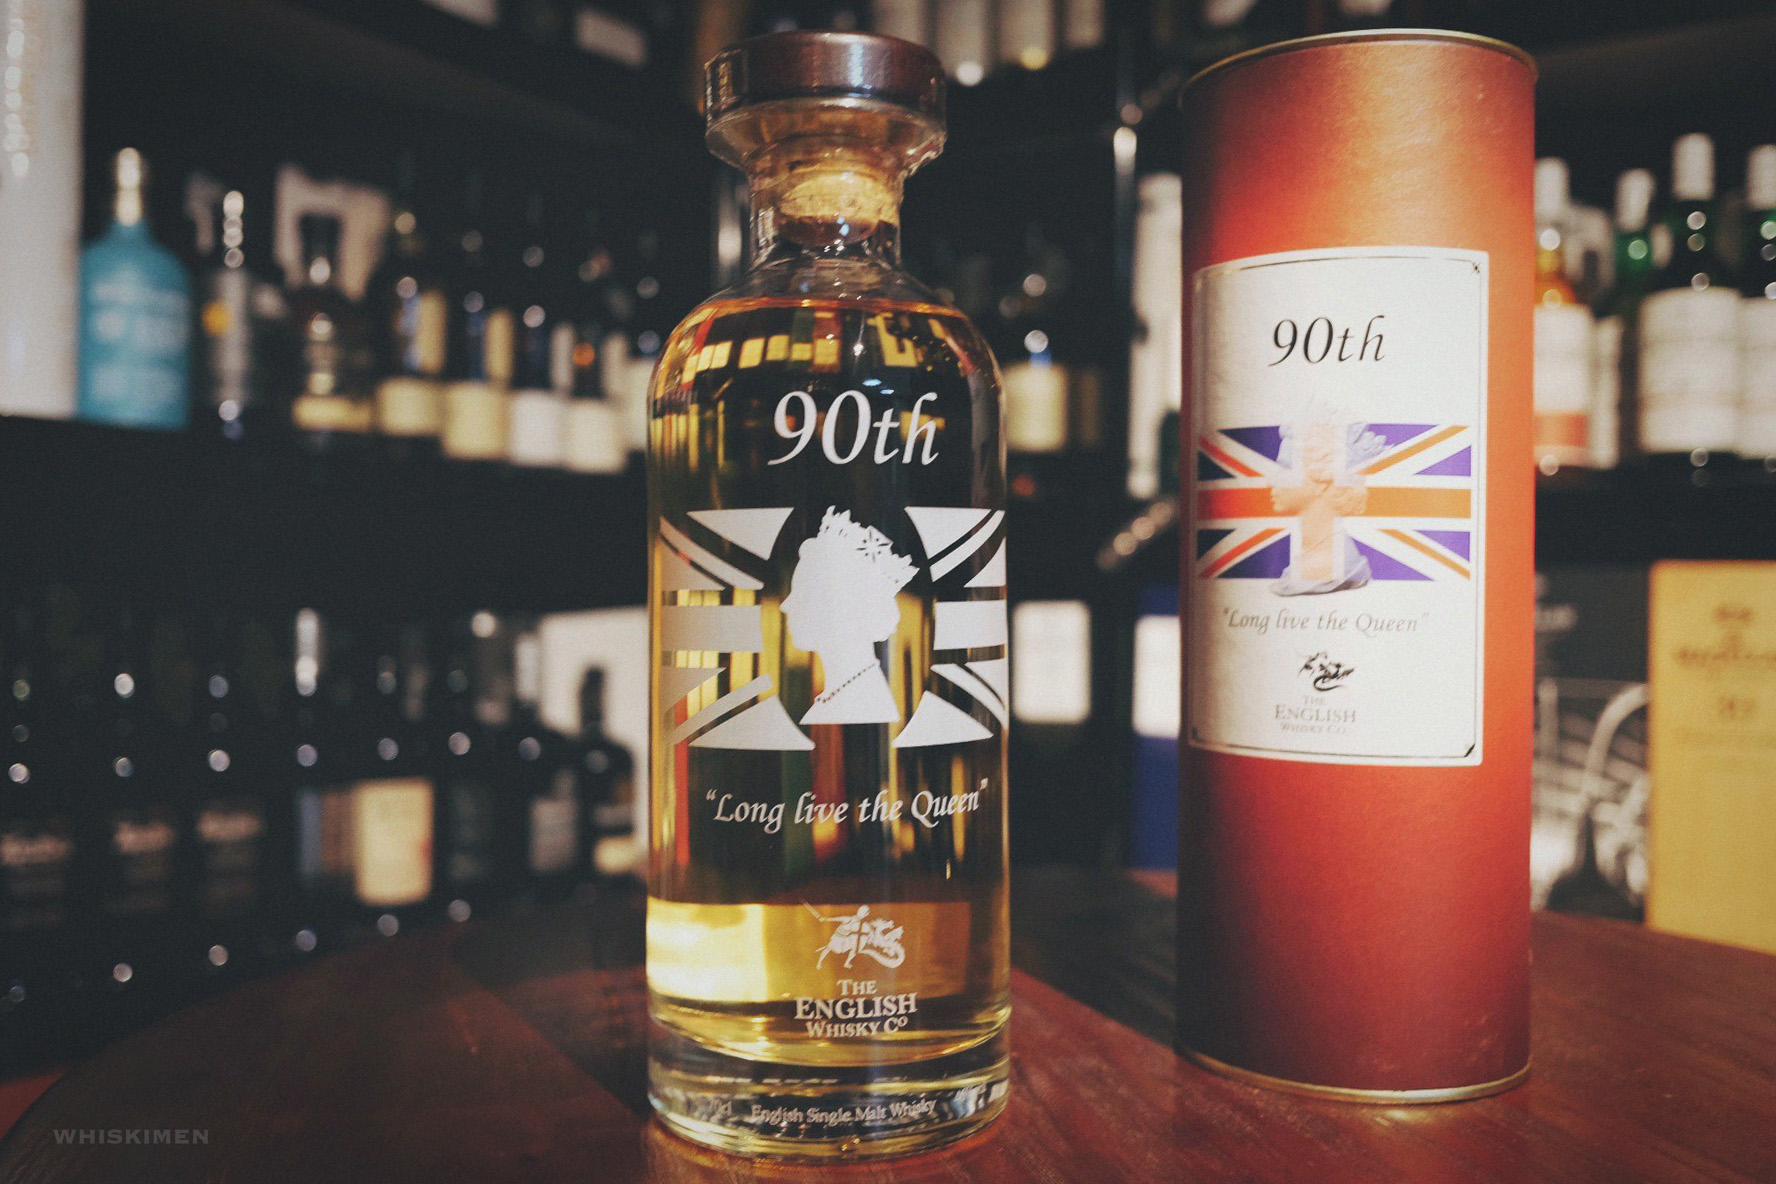 The English Whisky Co. English Single Malt Whisky (Queen Elizabeth II 90th Birthday)